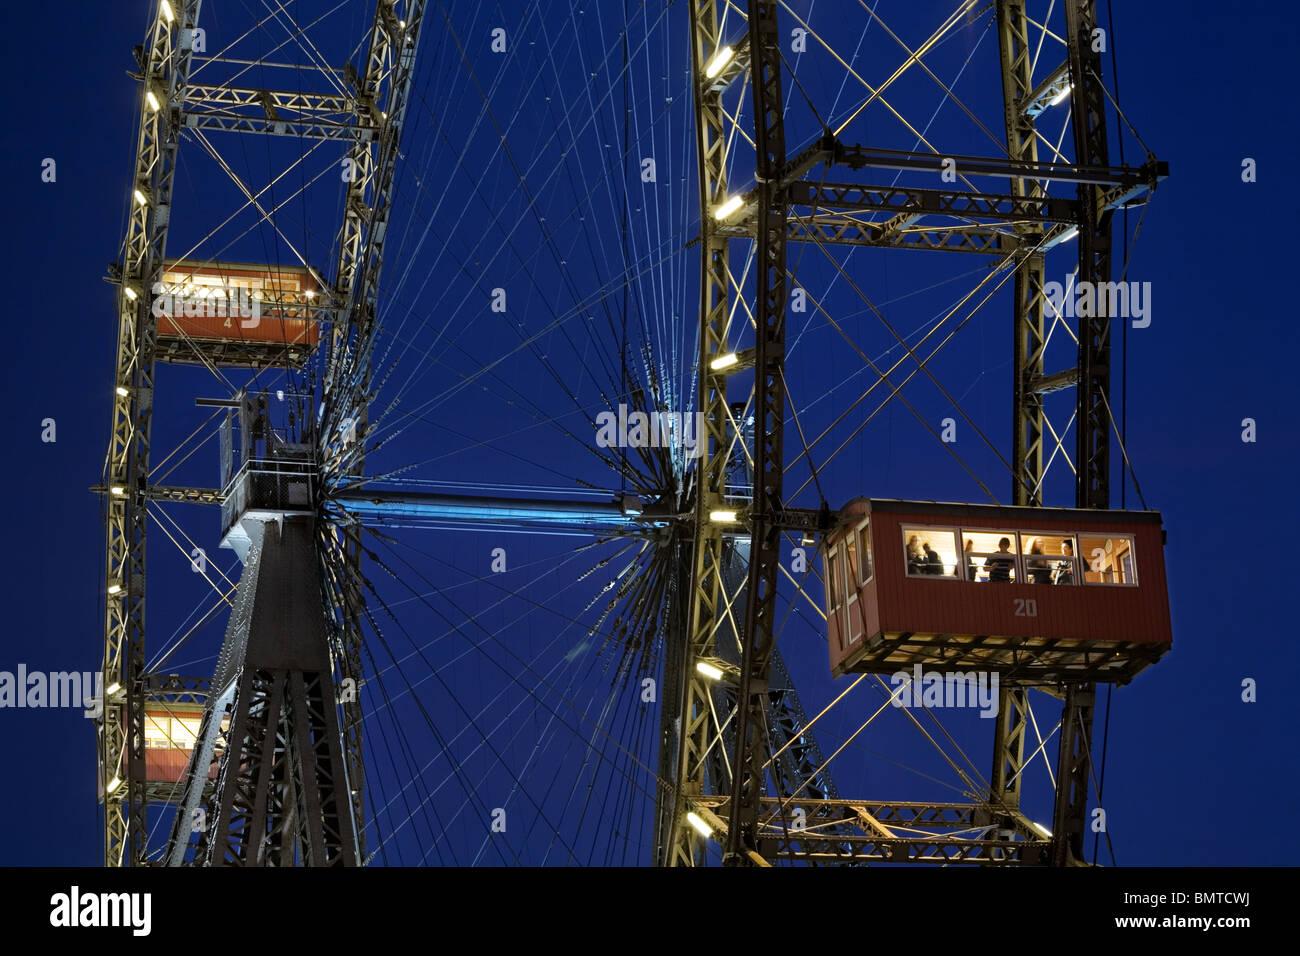 Riesenrad Ferris wheel Vienna, Austria - Stock Image